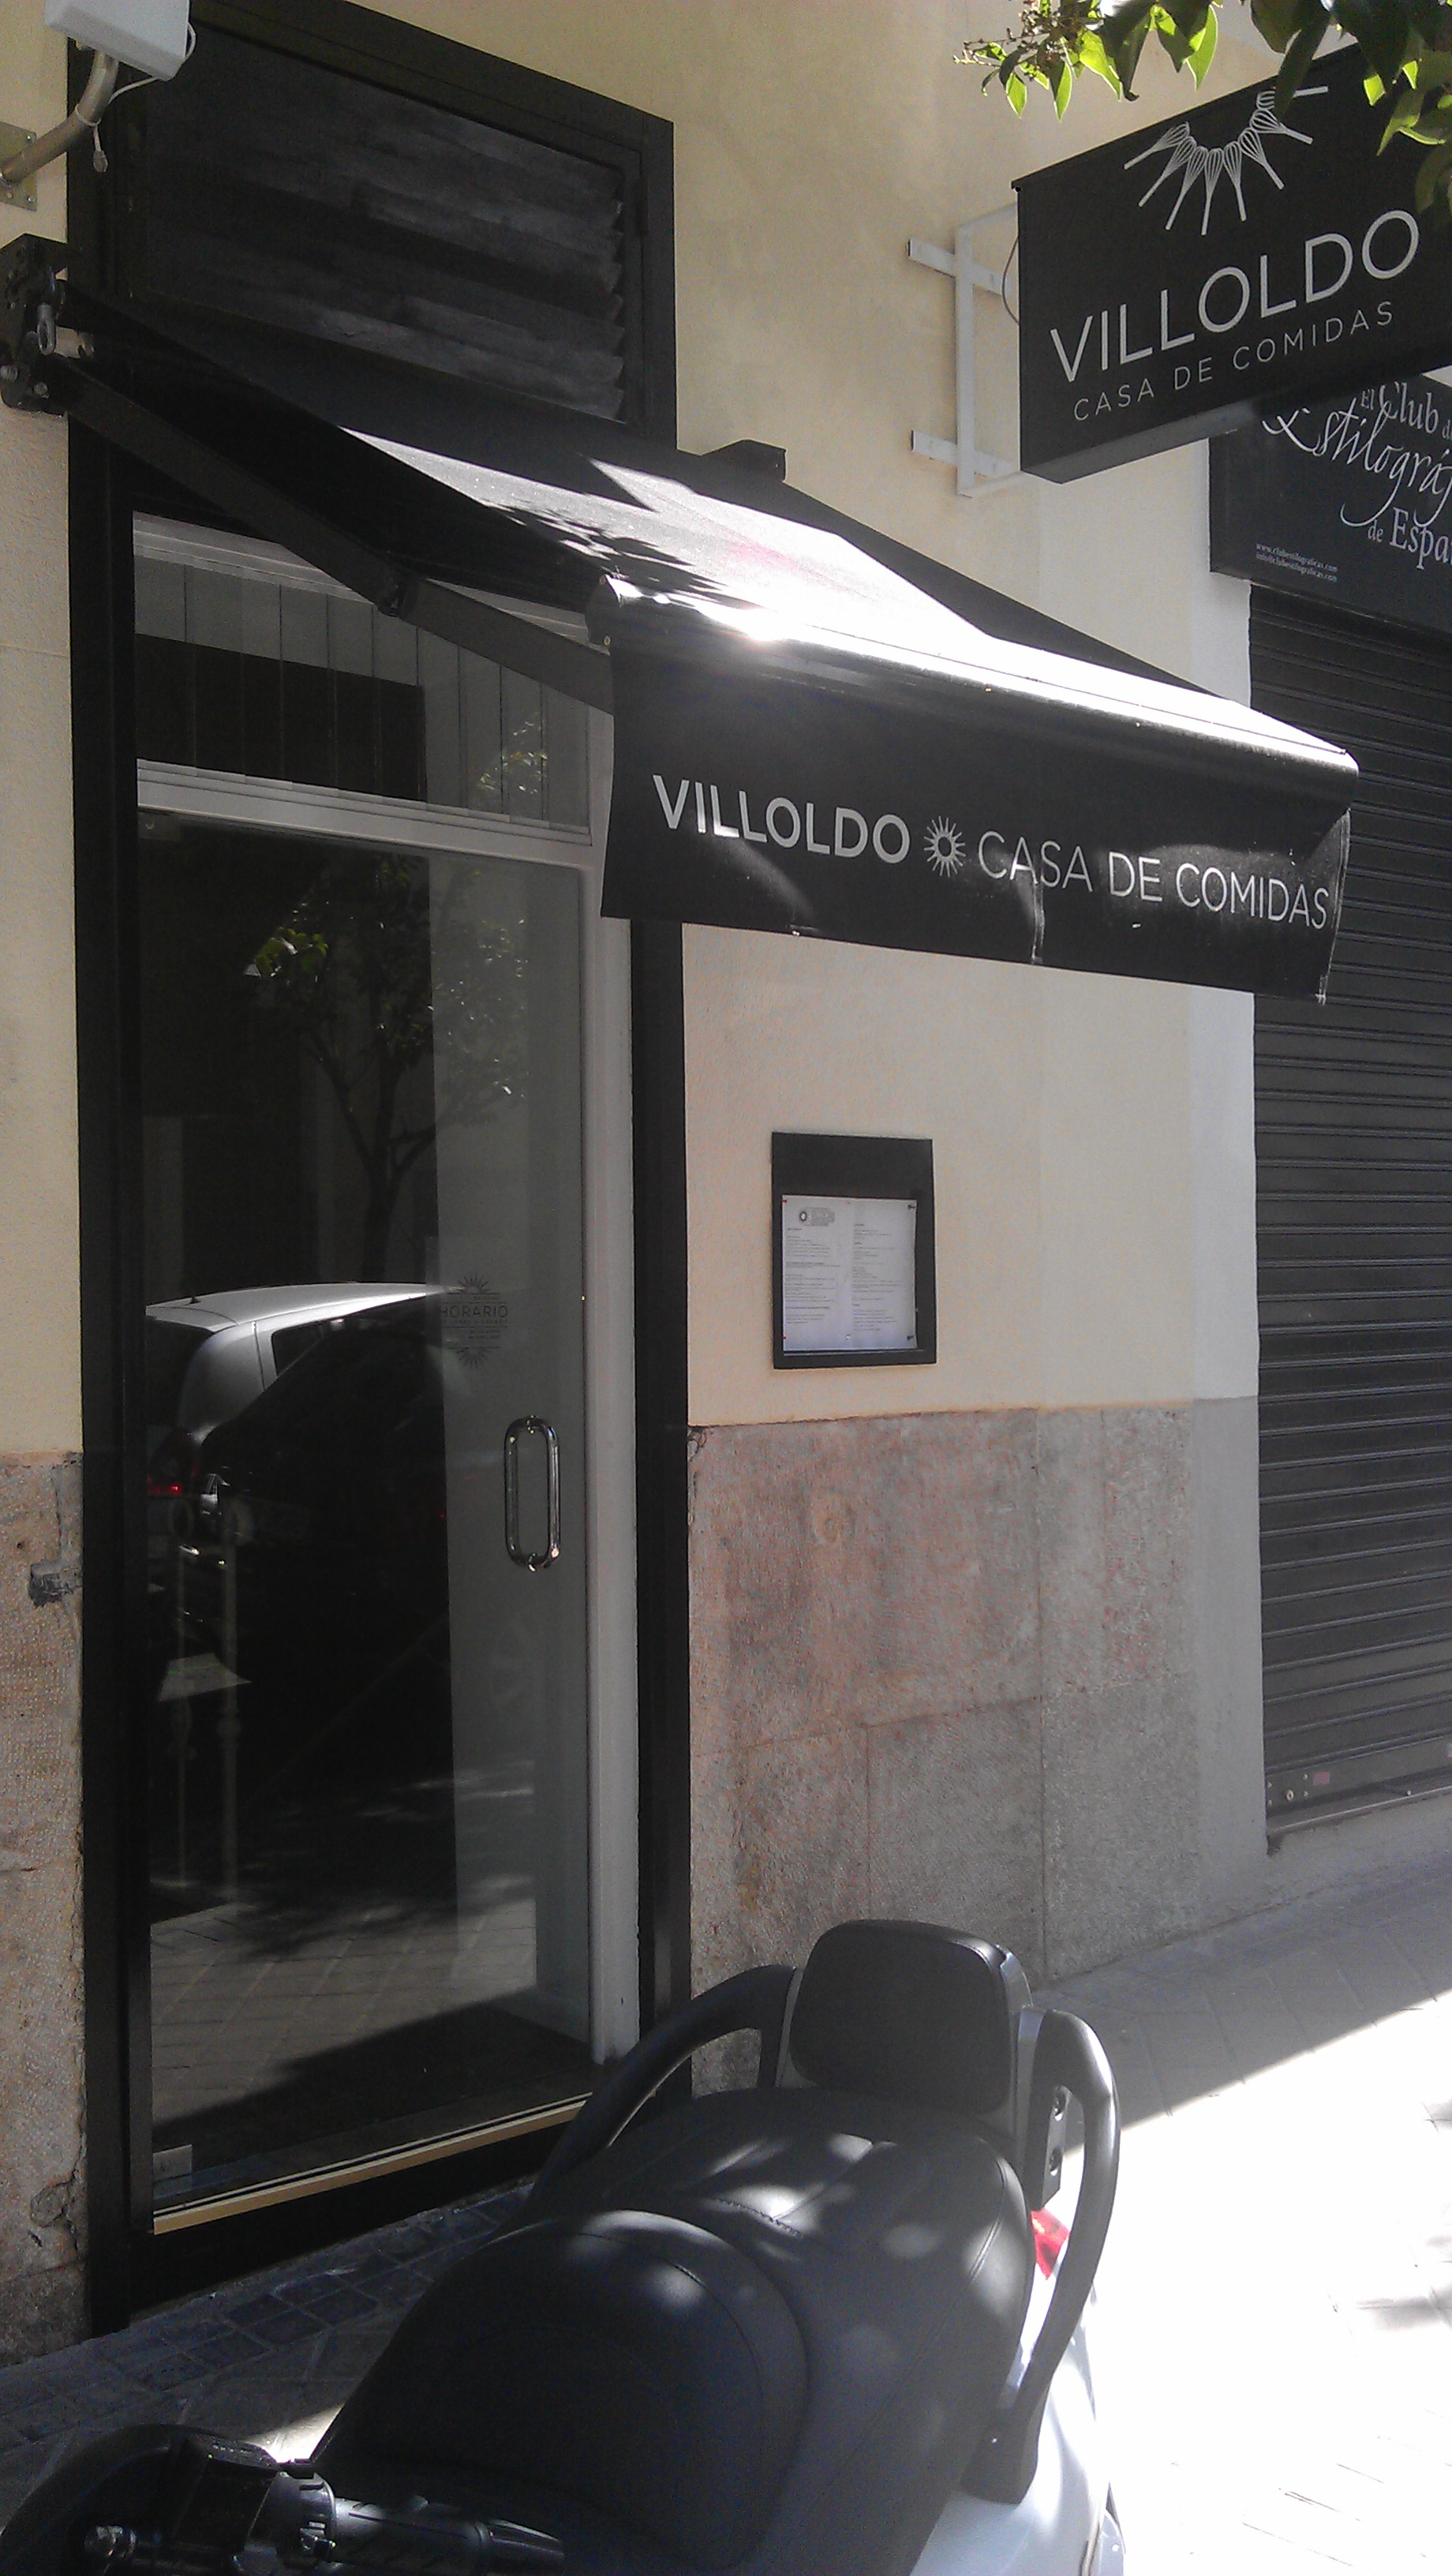 Restaurante Villoldo fachada Te Veo en Madrid